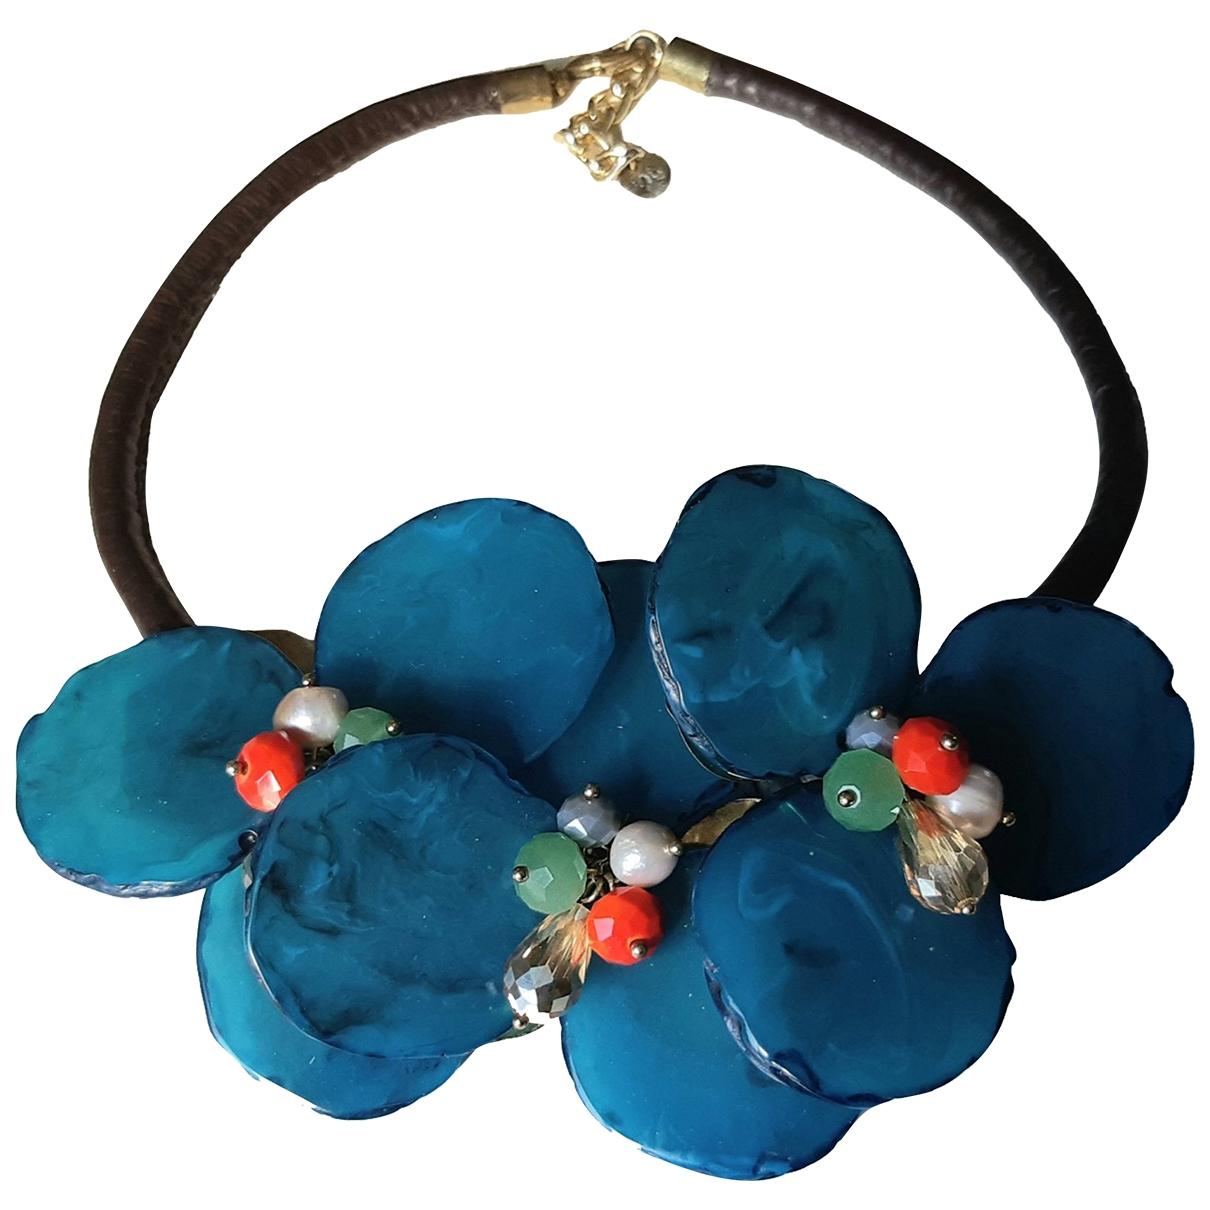 Collar Motifs Floraux Non Signe / Unsigned